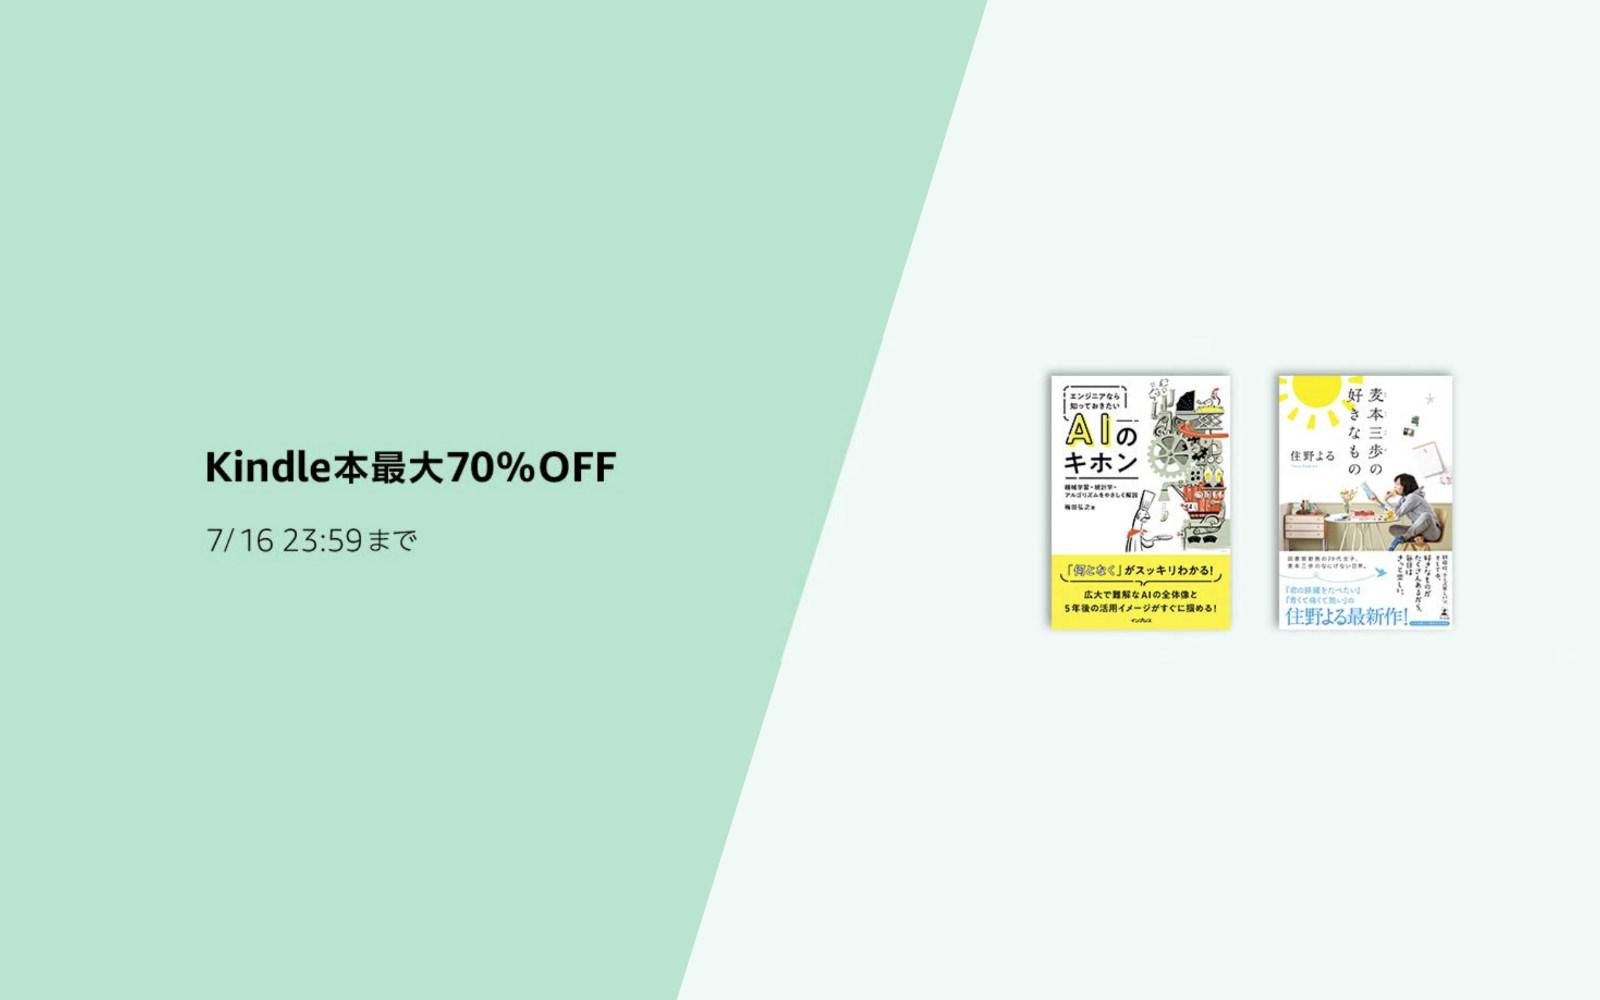 Kindle-PrimeDay-Sale-70percent-off.jpg